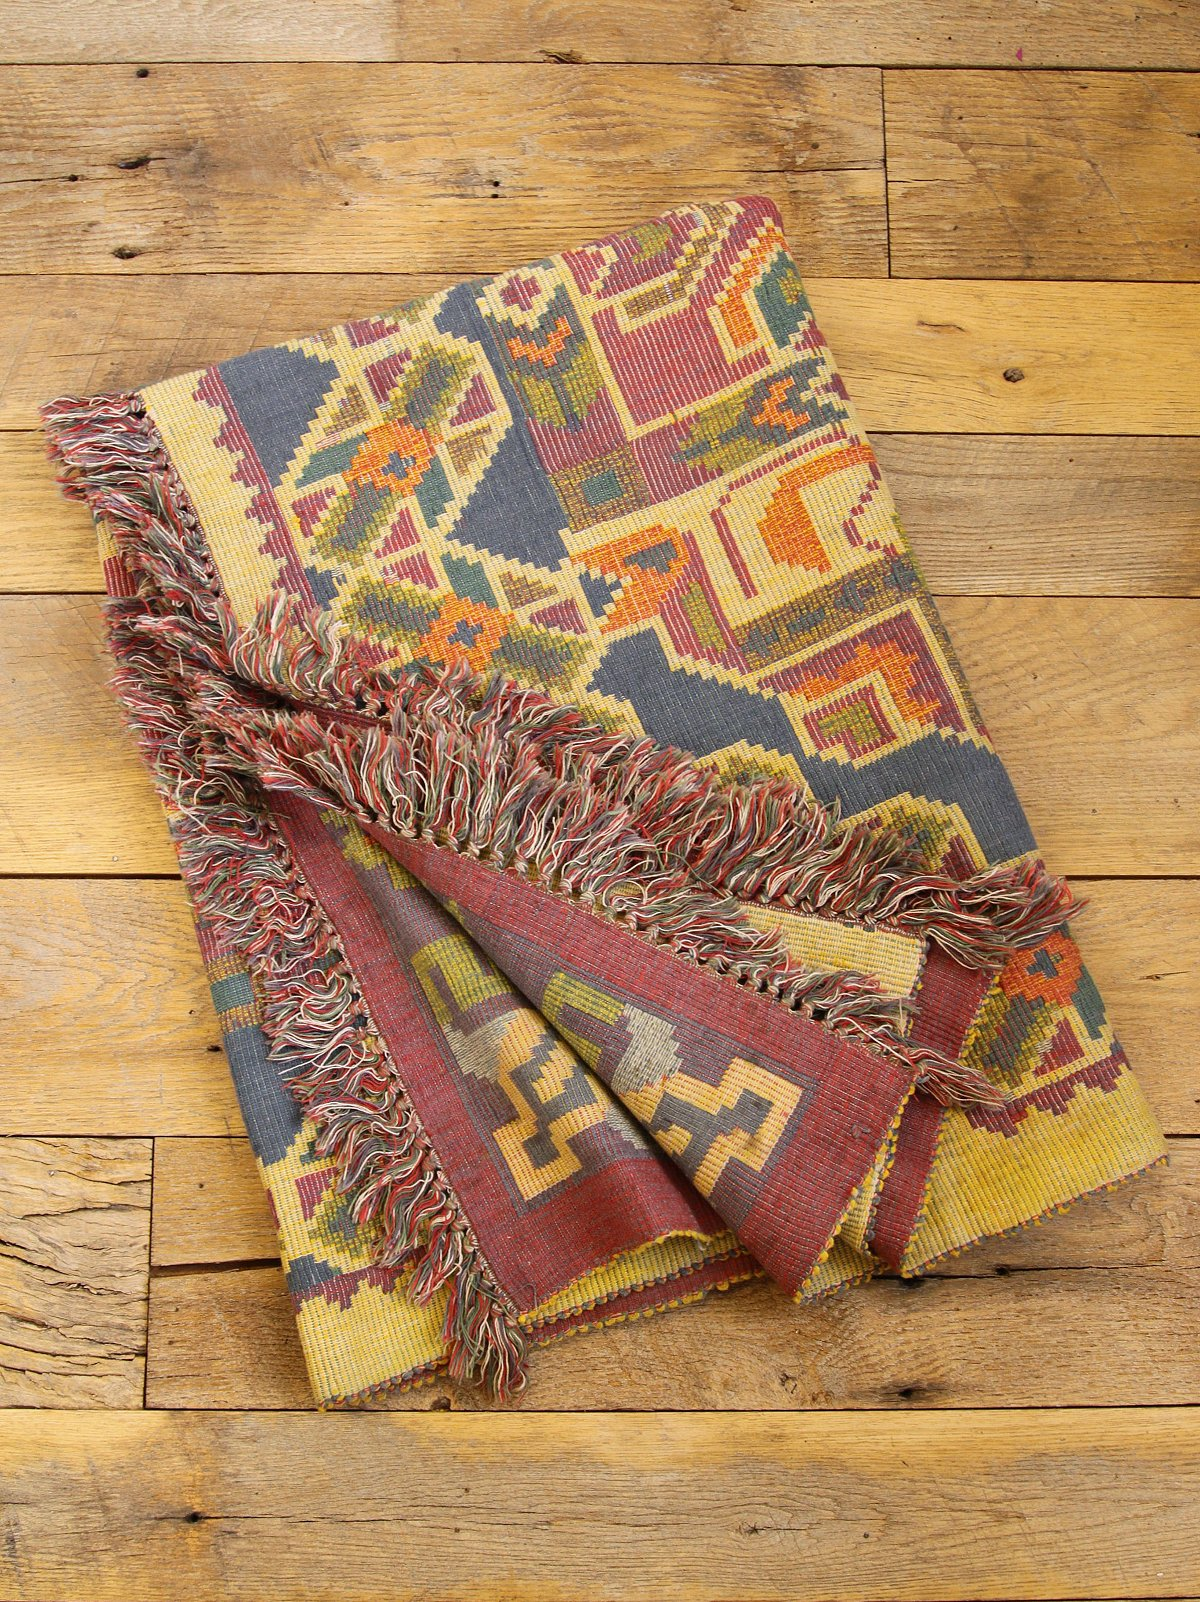 Vintage Colorful Woven Blanket